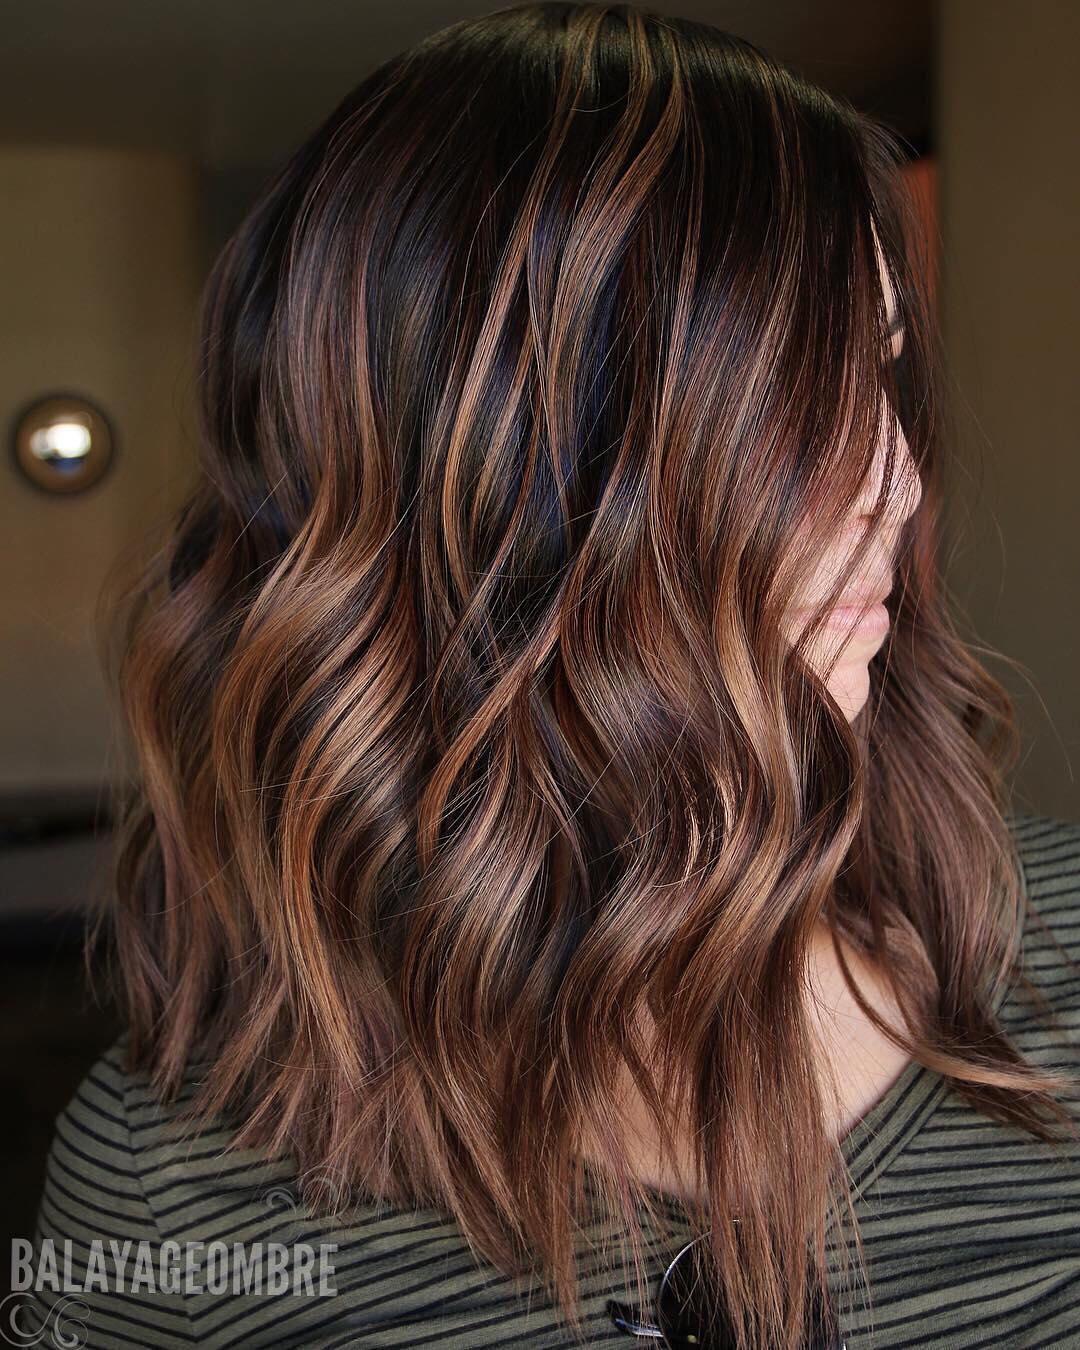 Best Brown Balayage Hair Designs for Medium Length Hair, Medium Hairstyle Color